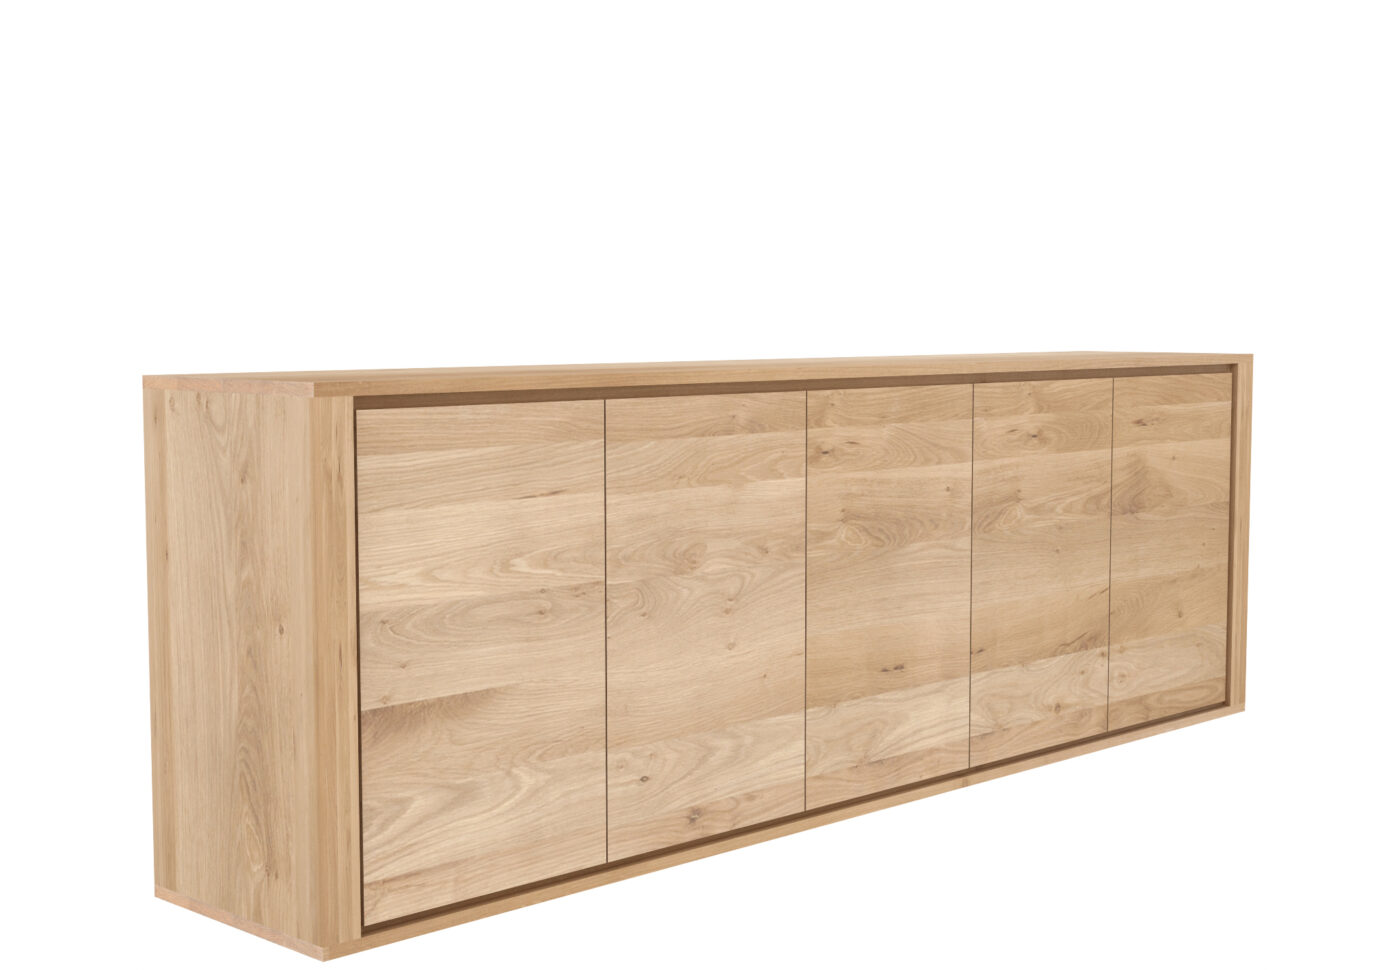 51373 Oak Shadow sideboard 5 doors p